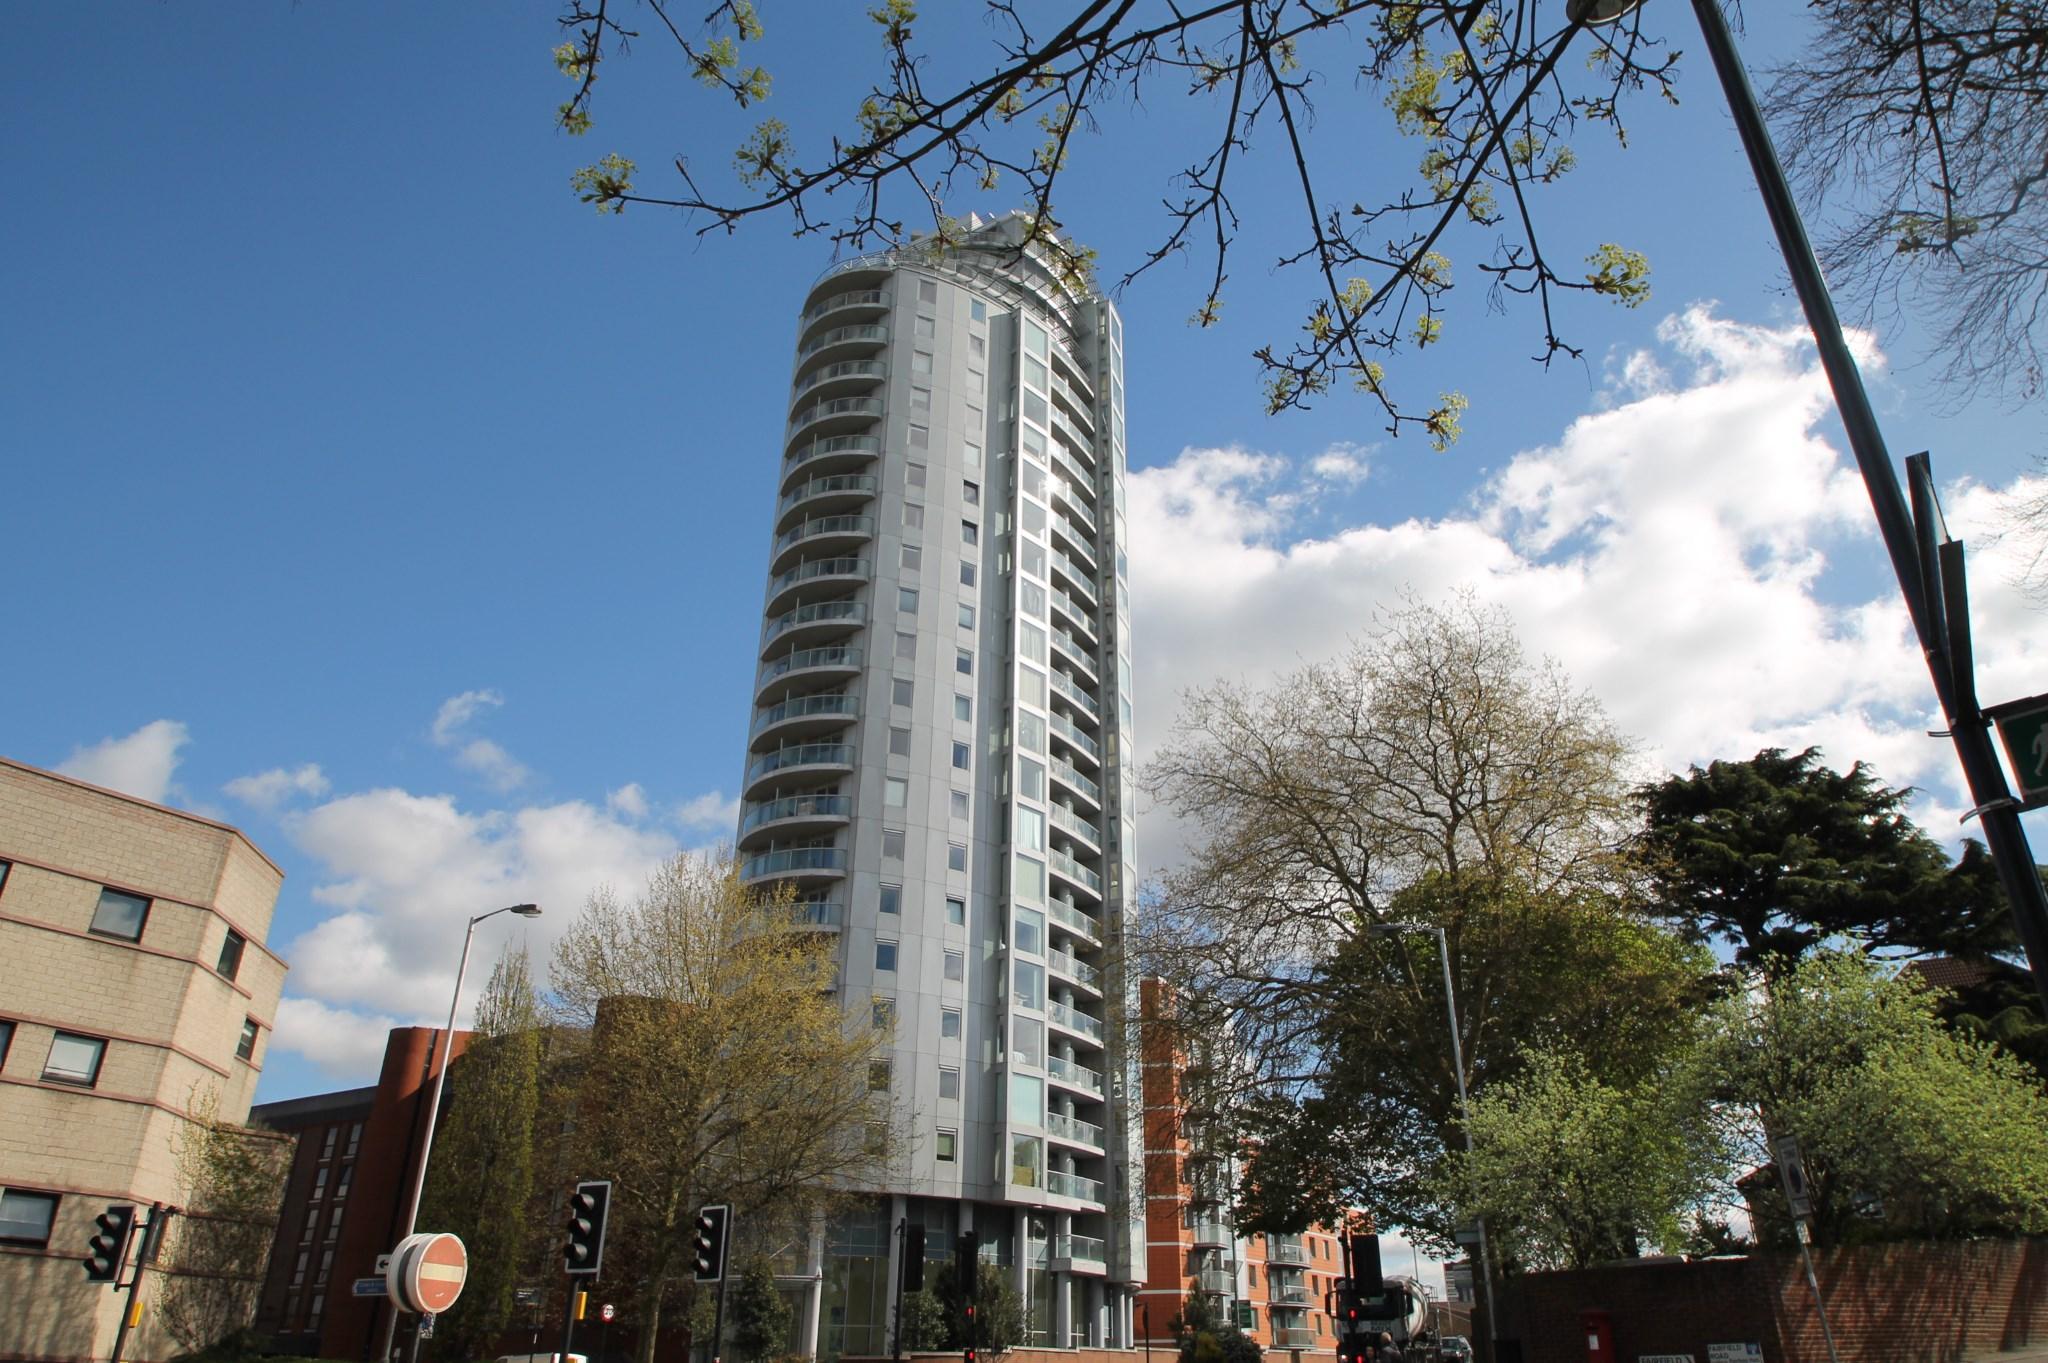 Altitude Apartments, 9 Altyre Road, Croydon, CR0